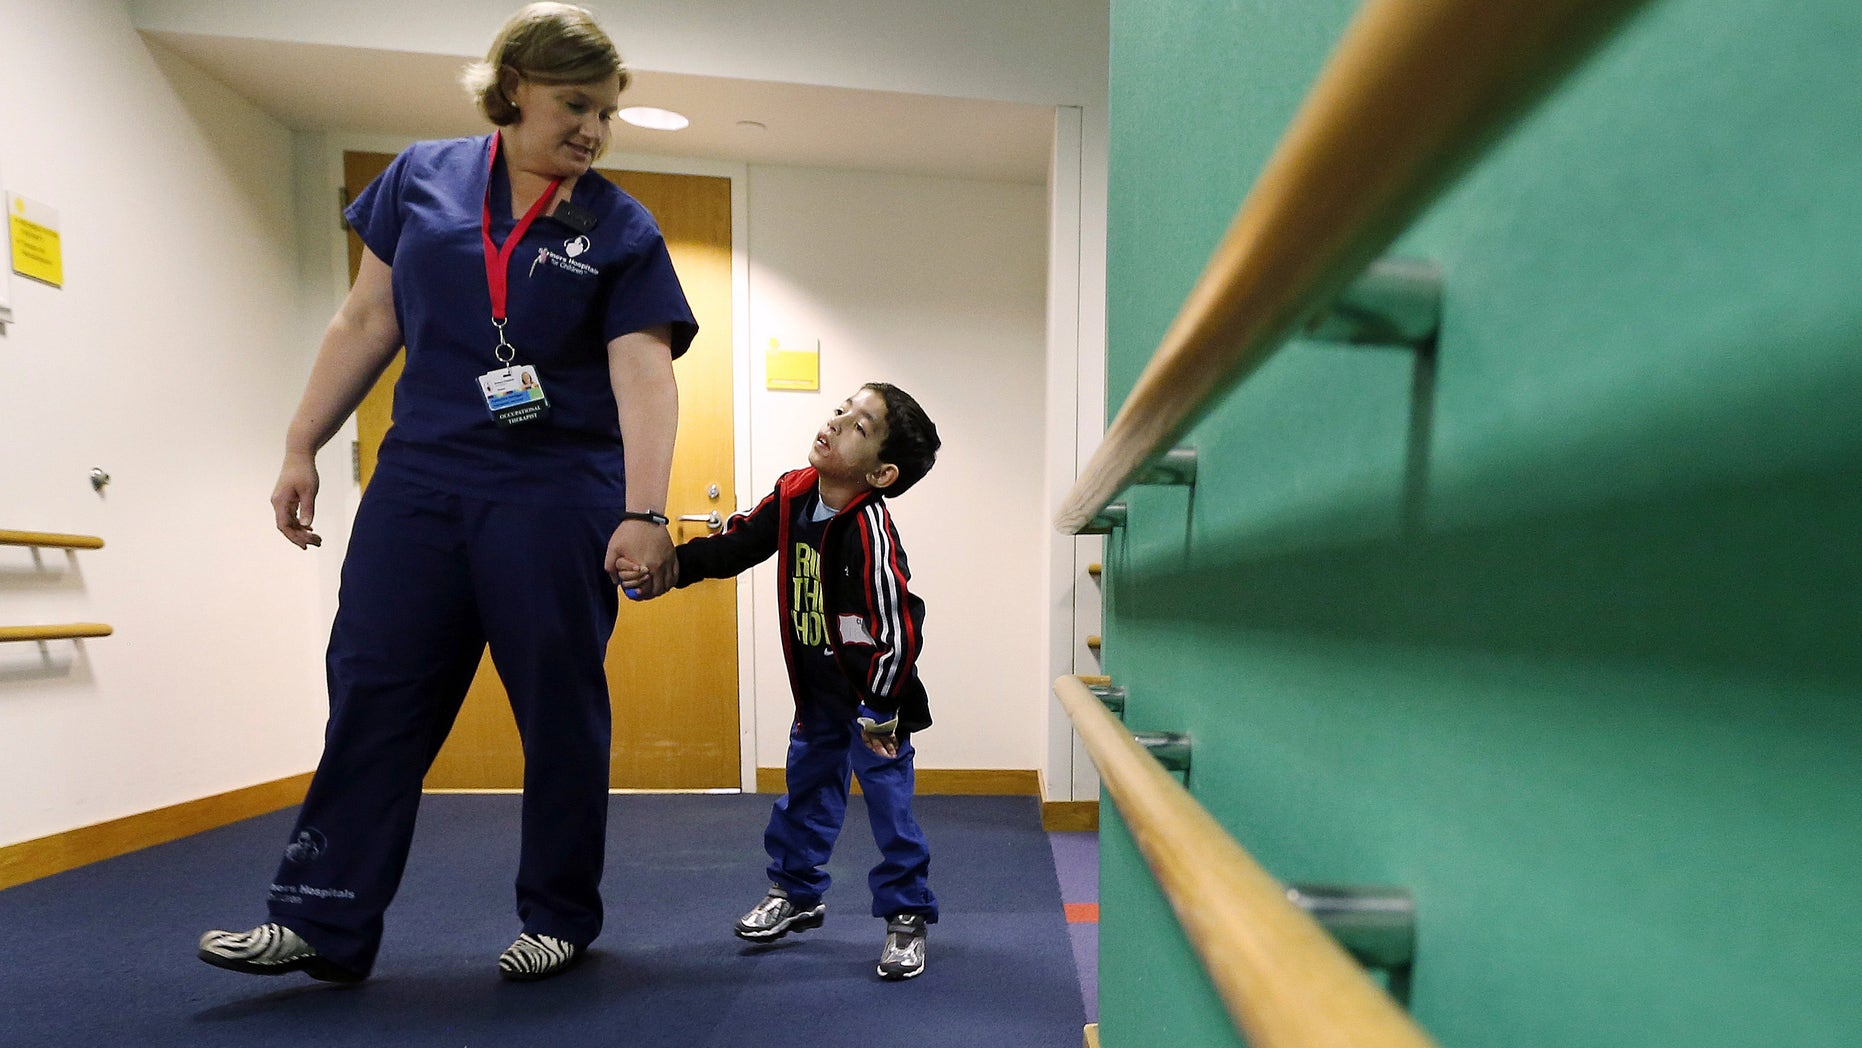 Therapist Katherine Hartigan walks with Ihor Lakatosh at Shriners Hospital for Children in Boston. (AP Photo/Michael Dwyer)